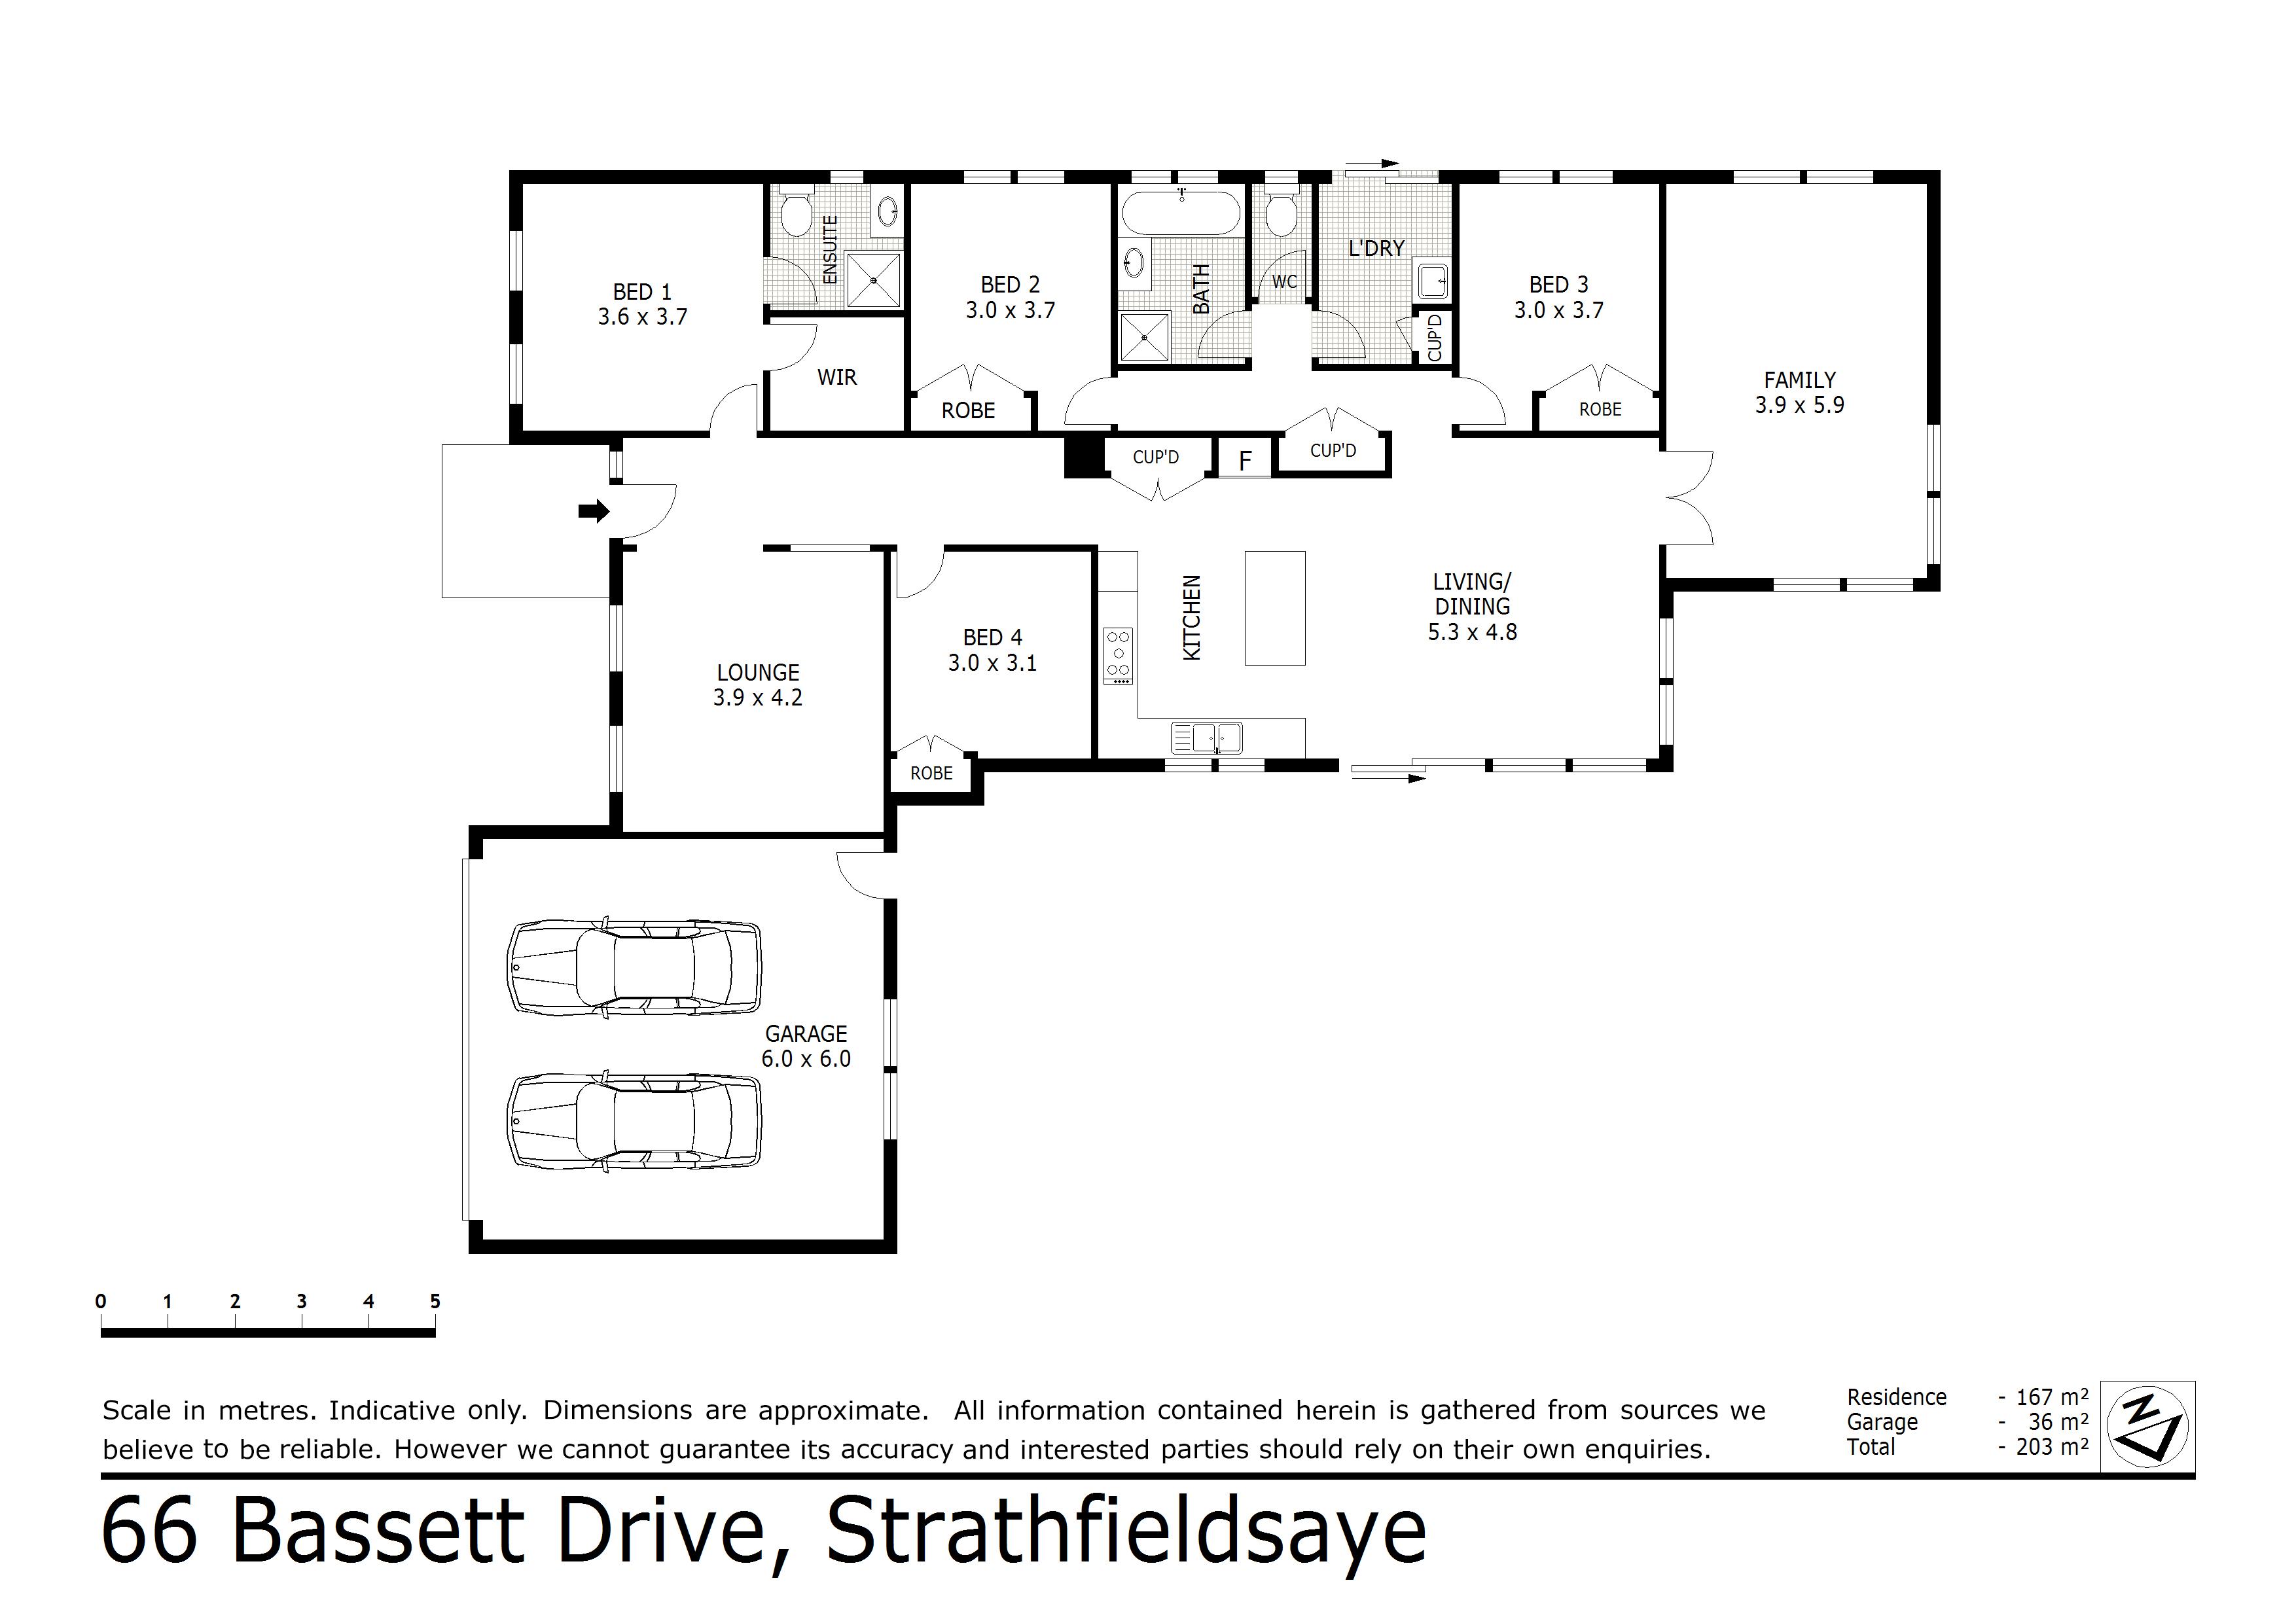 66 Bassett Drive, Strathfieldsaye, VIC 3551